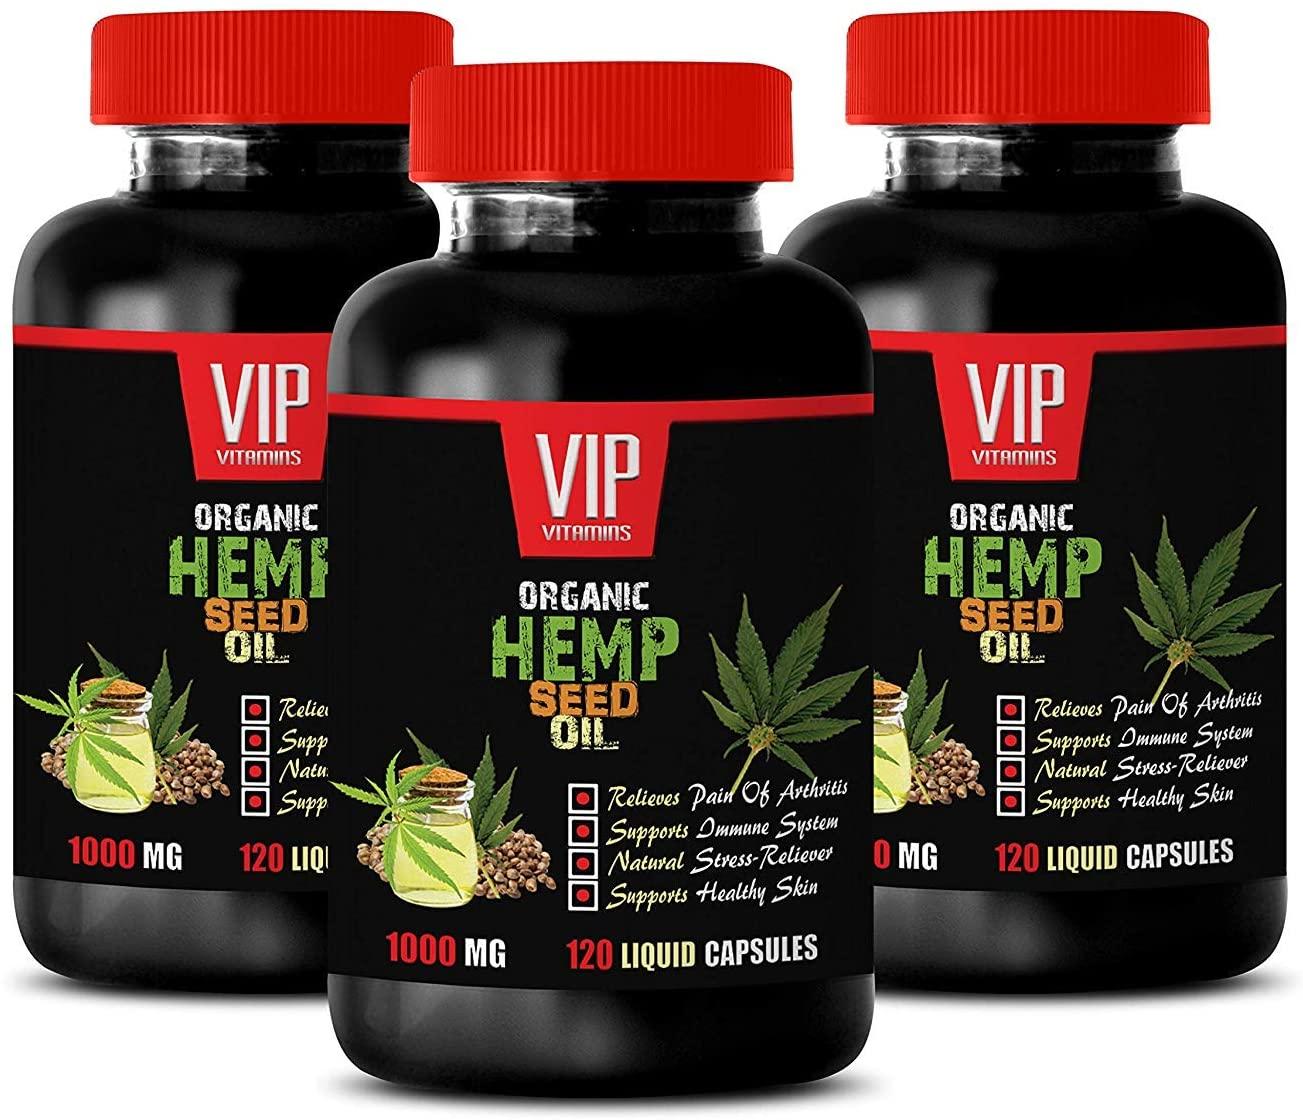 Anxiety Supplements - Organic Hemp Seed Oil 1000MG - Pain Relief - Brain and Heart Health - Mood Boosting Vitamins - 3 Bottle (360 Liquid Caps)